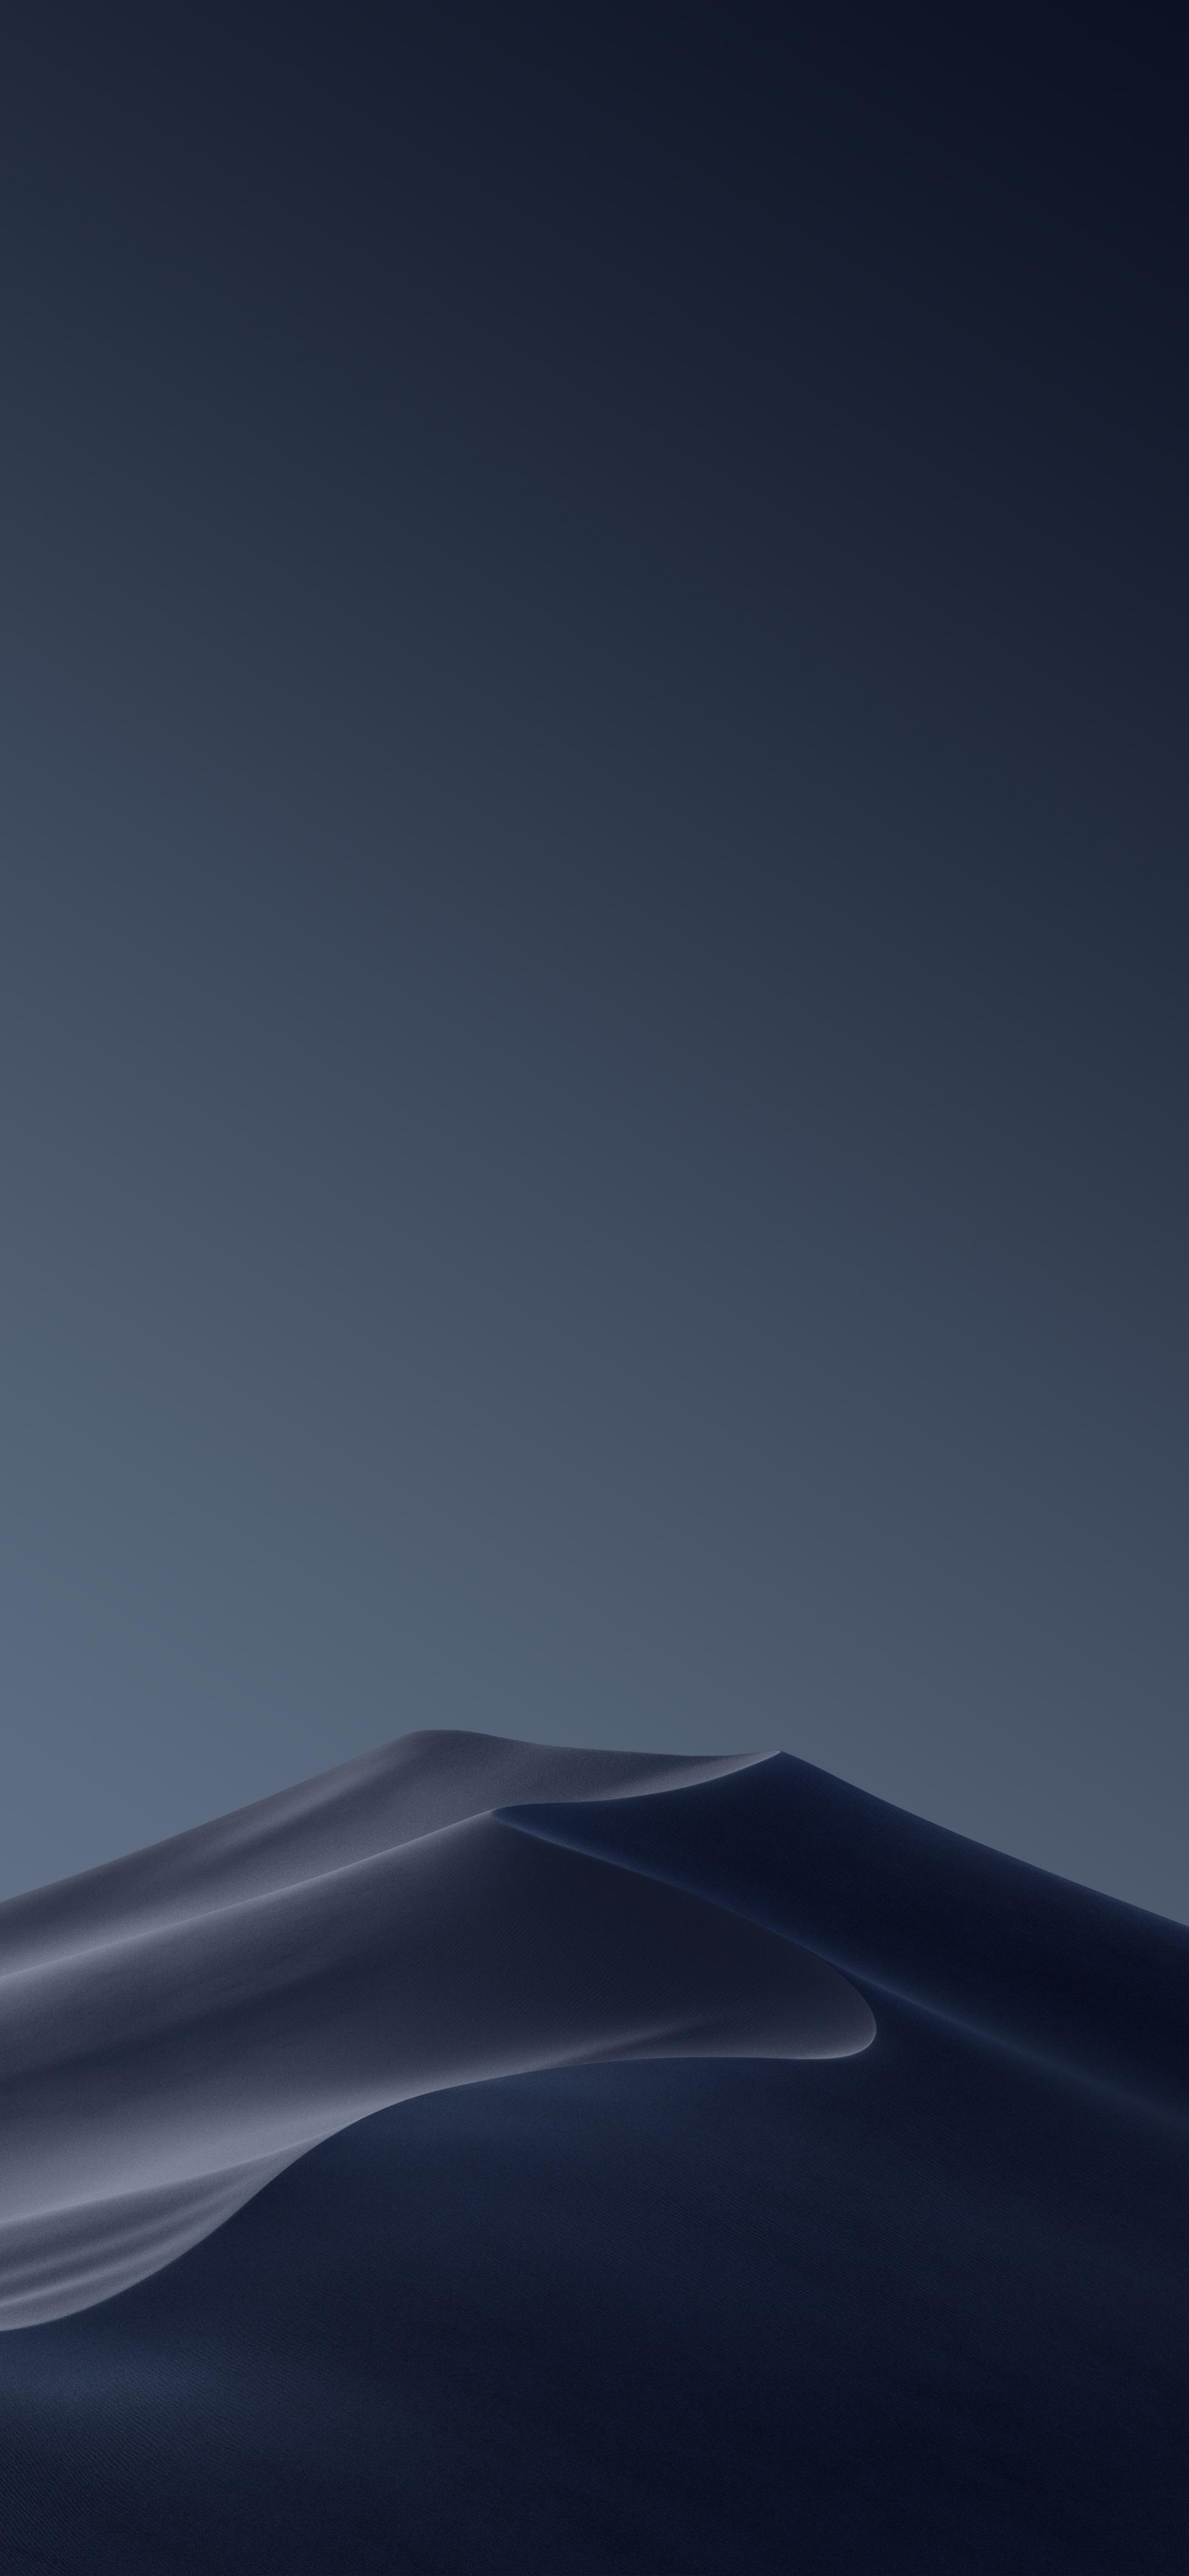 Free Download Macos Mojave Dark Mode Wallpaper Zollotech Wallpaper Iphone 1958x4242 For Your Desktop Mobile Tablet Explore 23 Macos Wallpapers Macos Wallpapers Macos Catalina Wallpapers